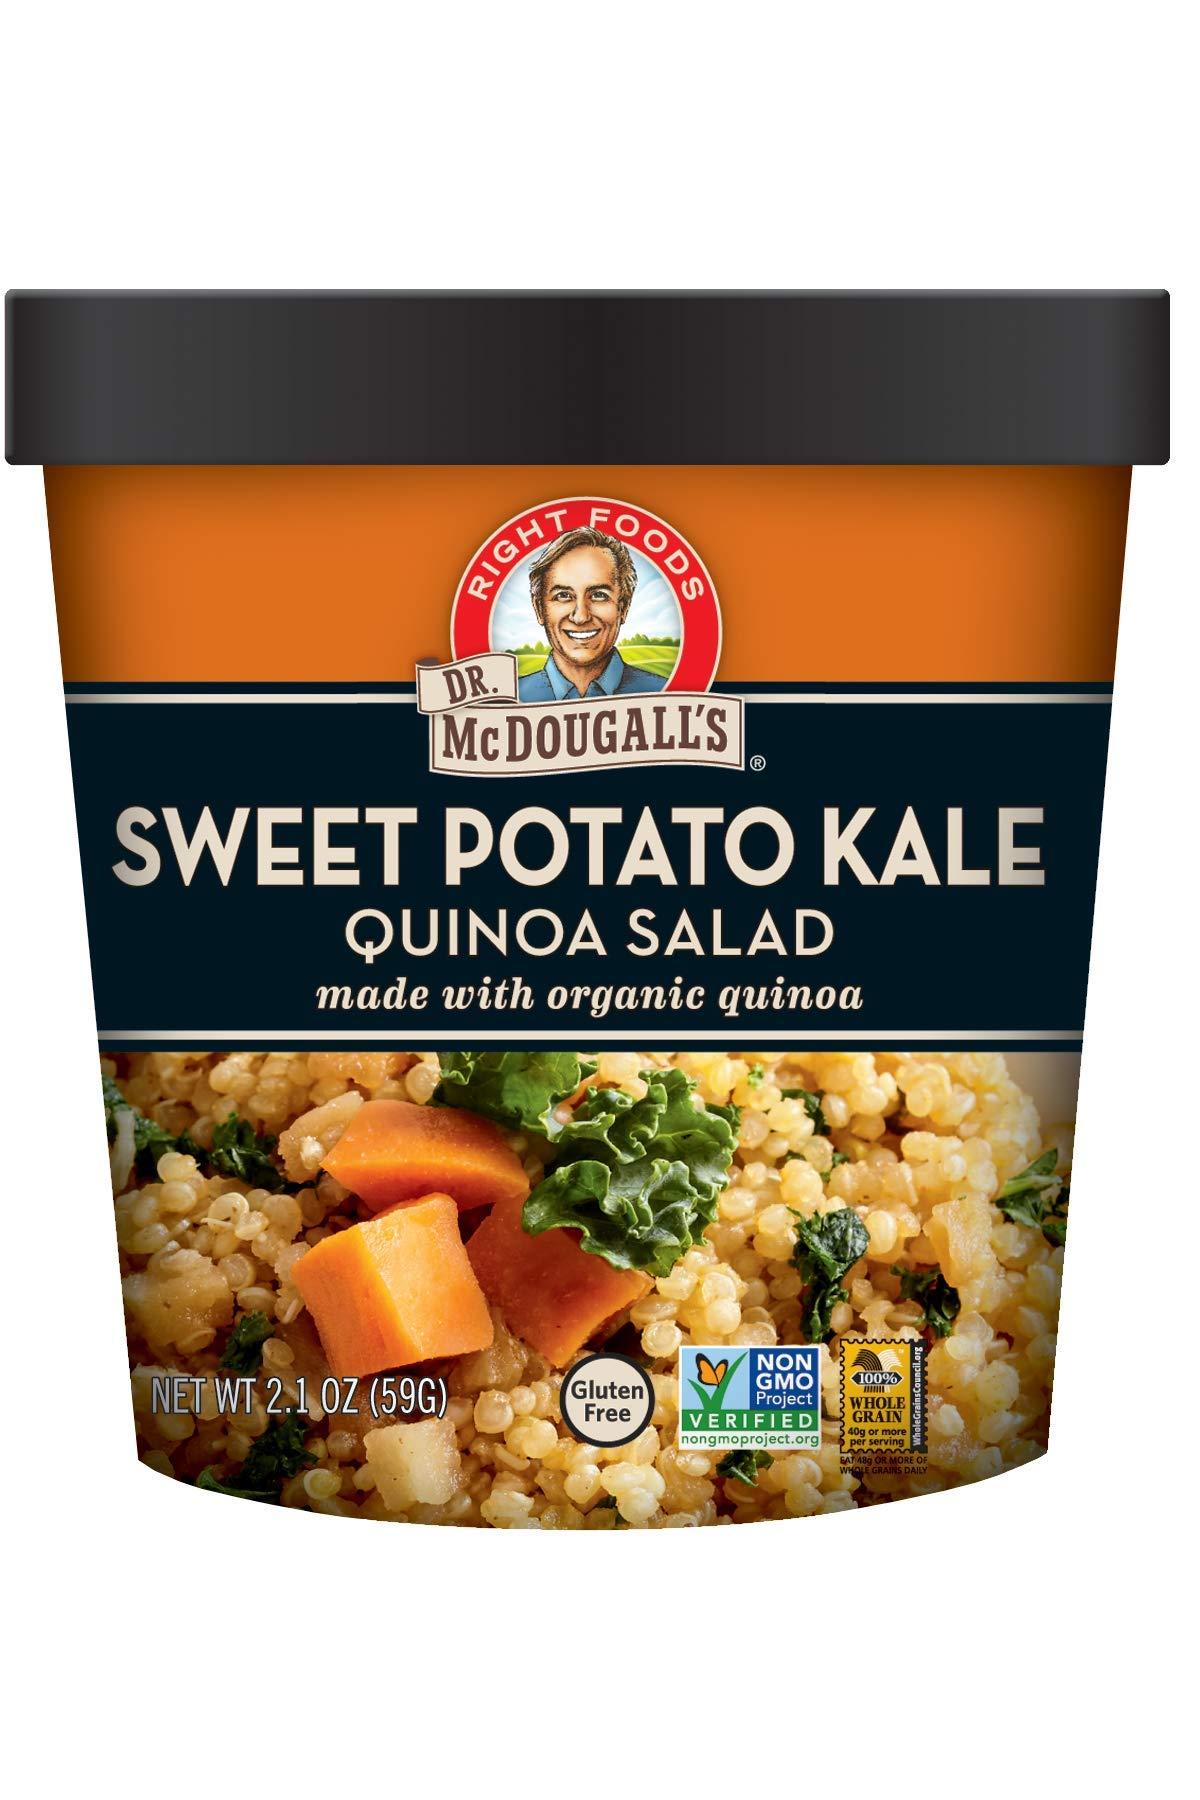 Dr. McDougall's Sweet Potato Kale Quinoa Salad, 2.1 Ounce by Dr. McDougall's